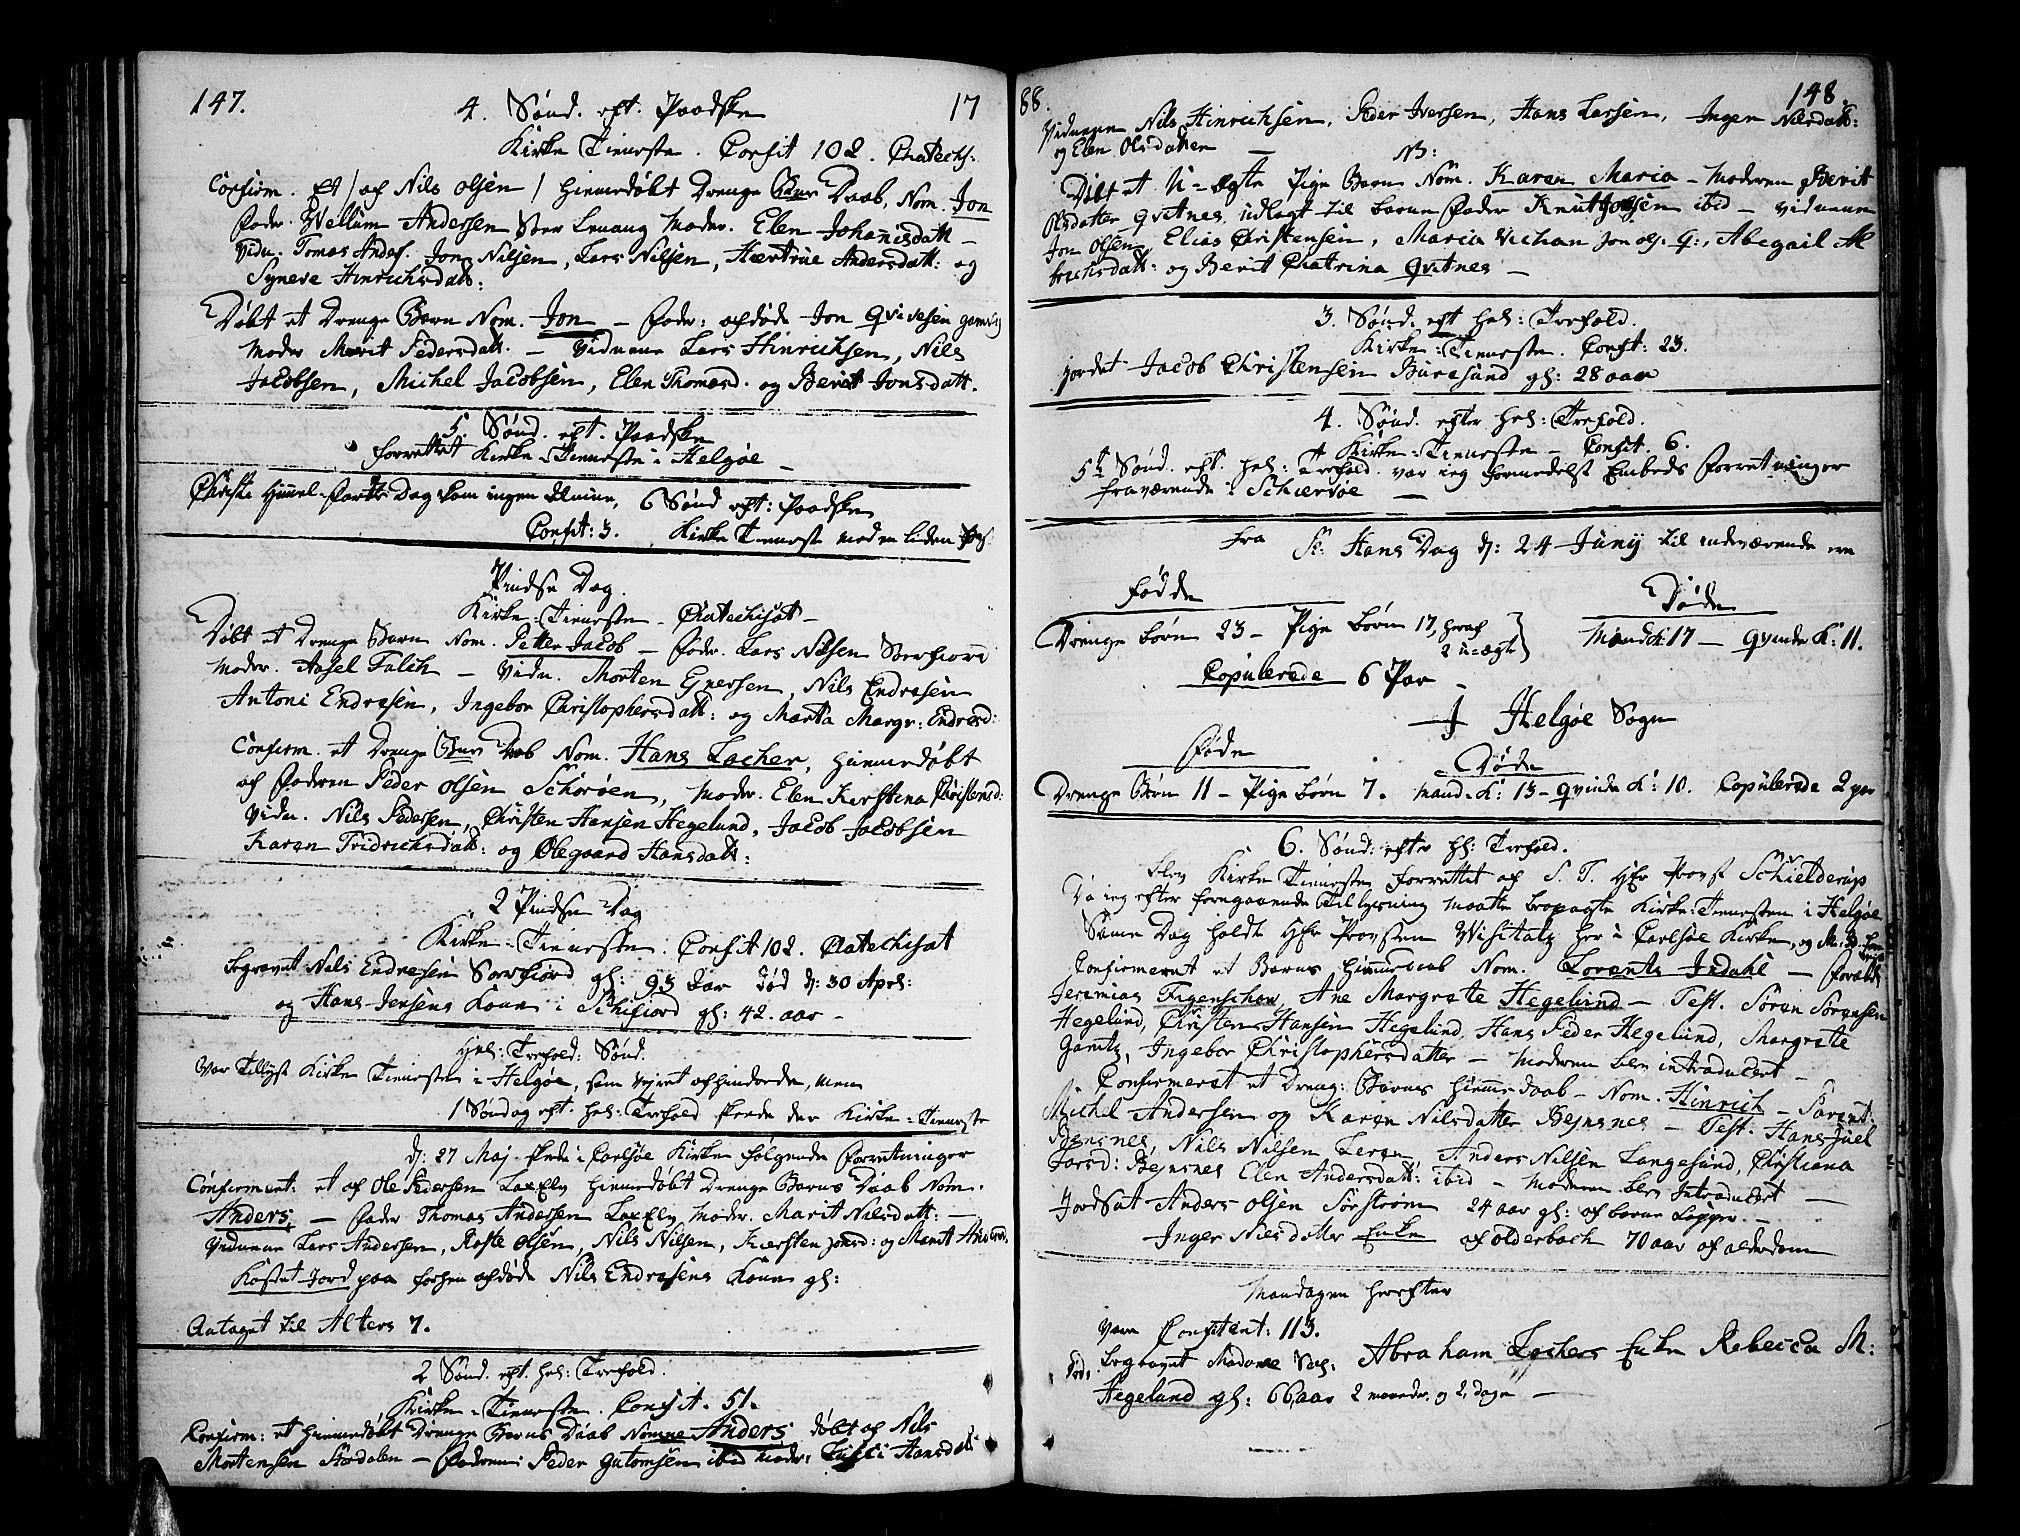 SATØ, Karlsøy sokneprestembete, H/Ha/Haa/L0001kirke: Ministerialbok nr. 1, 1775-1823, s. 147-148